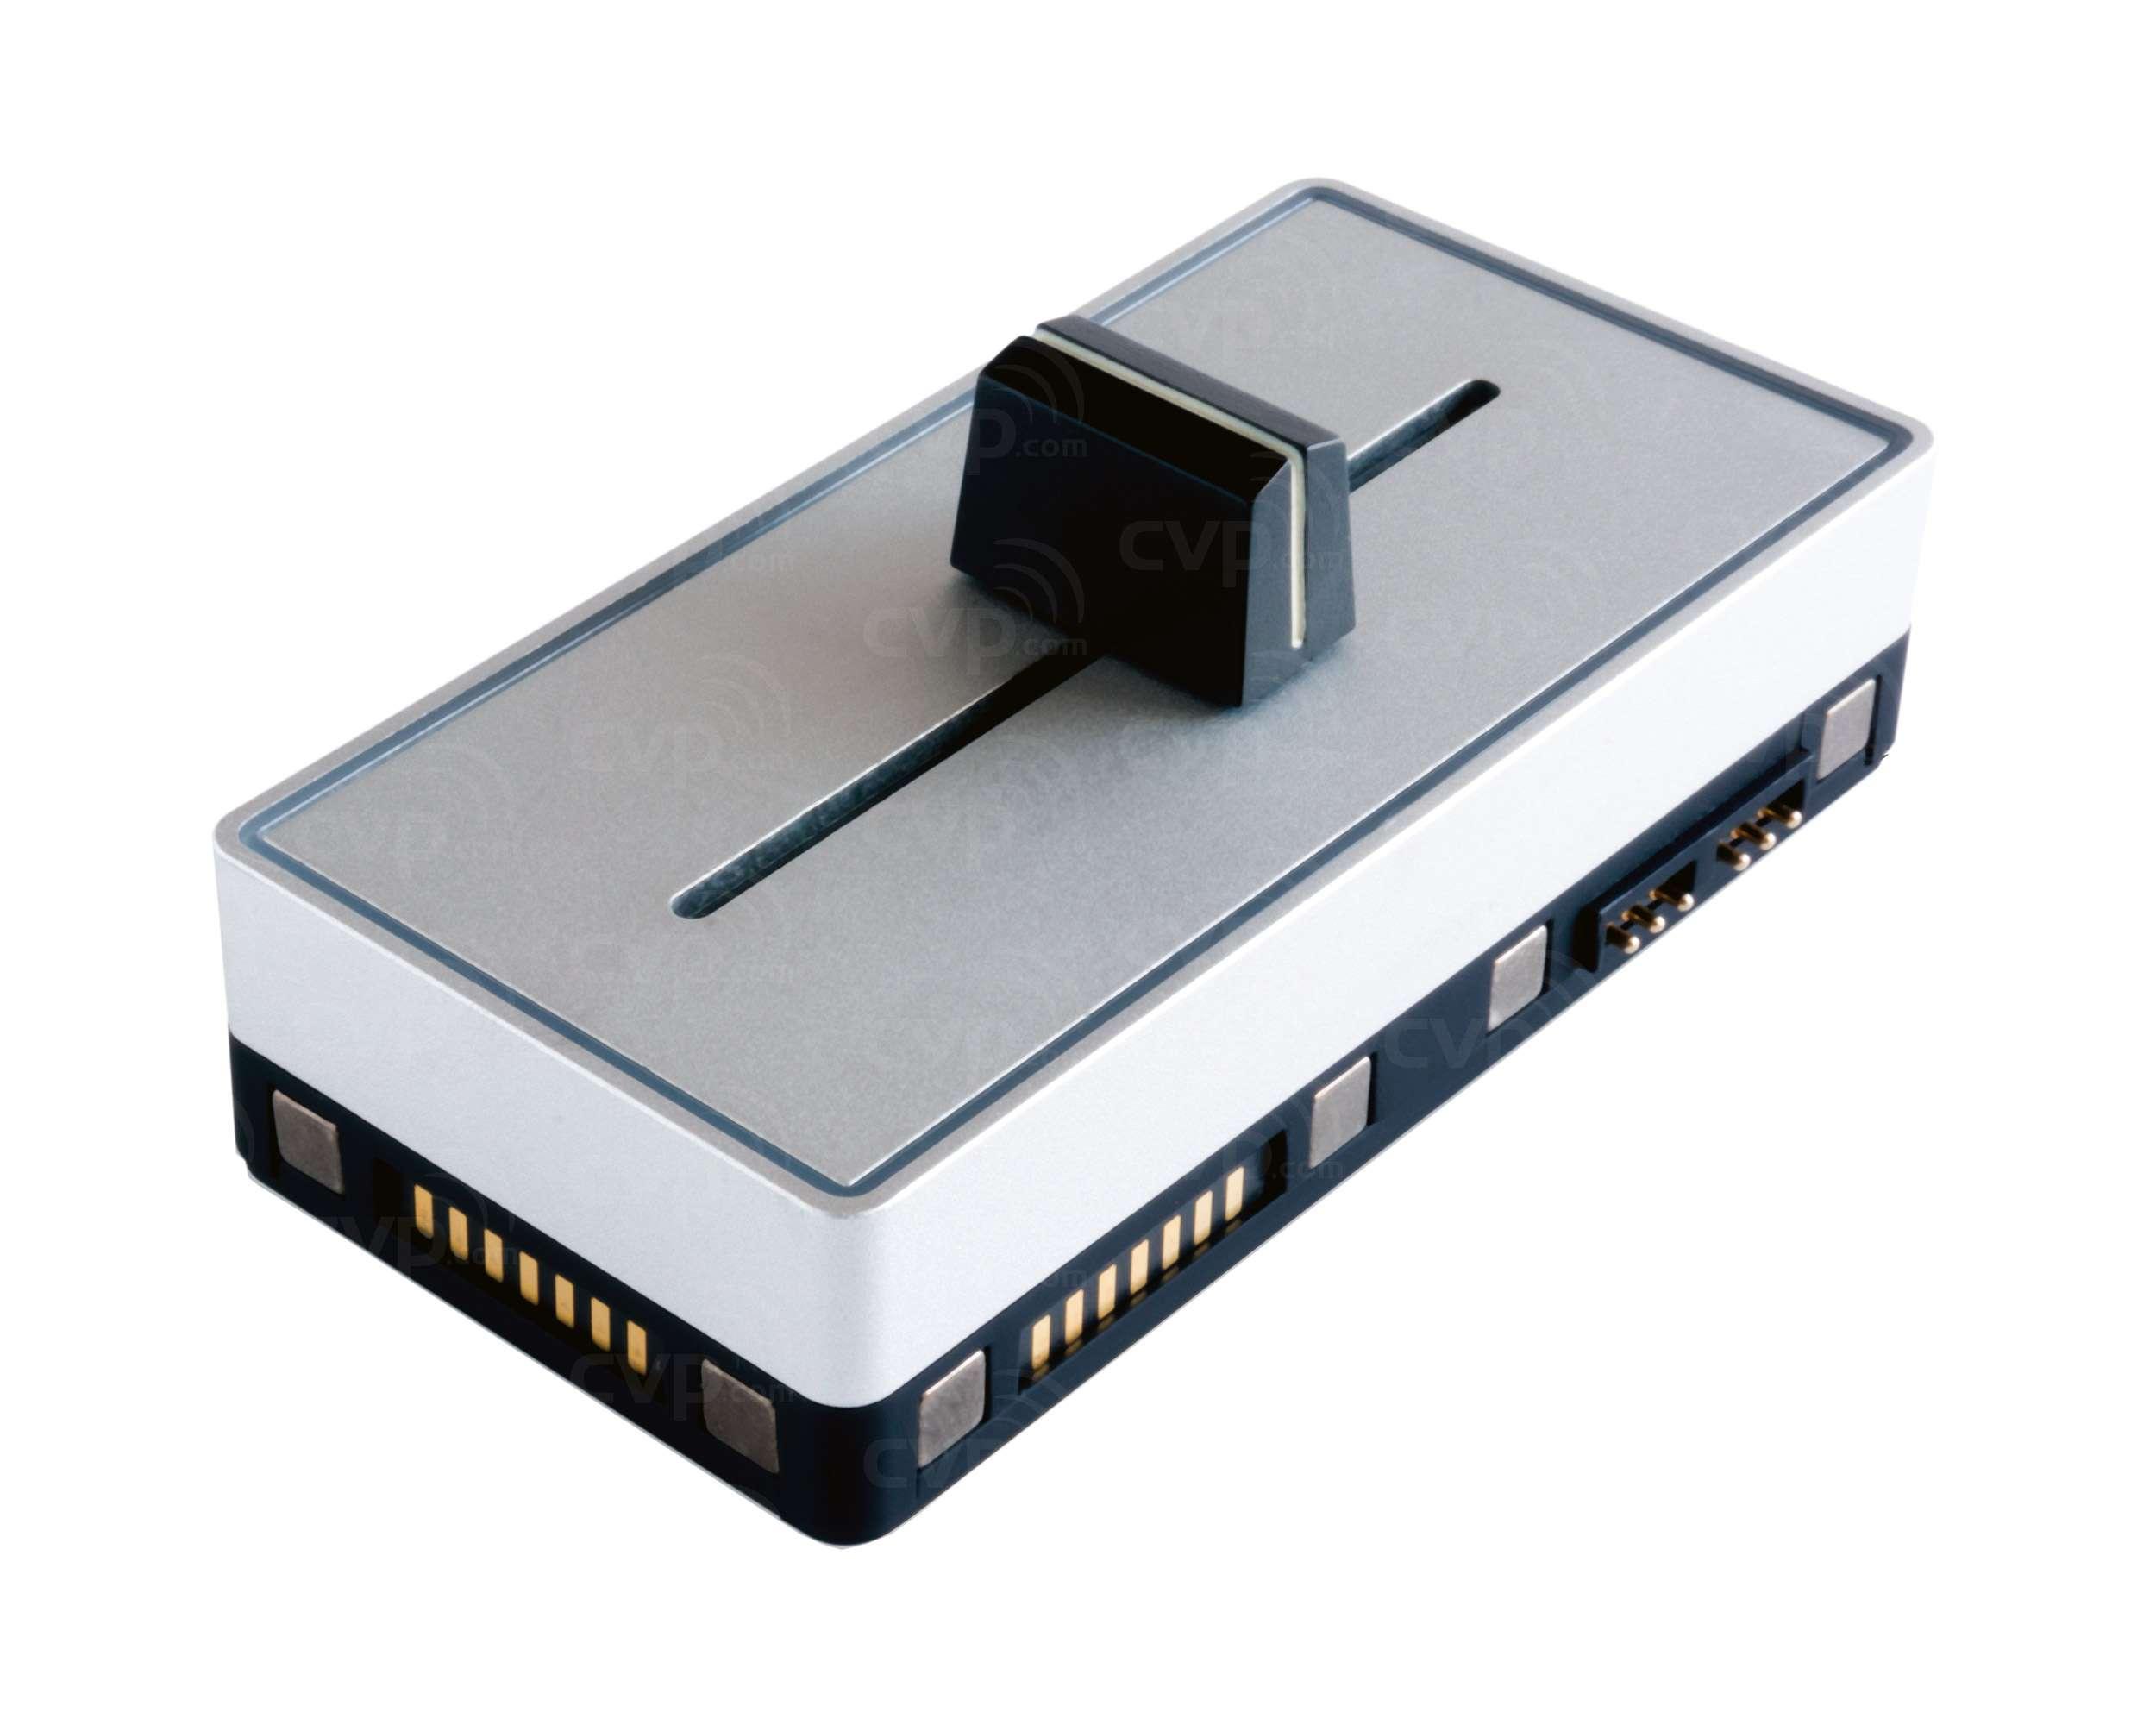 Palette Gear Modular Controls - High Sensitivity Slider Add-on (p/n